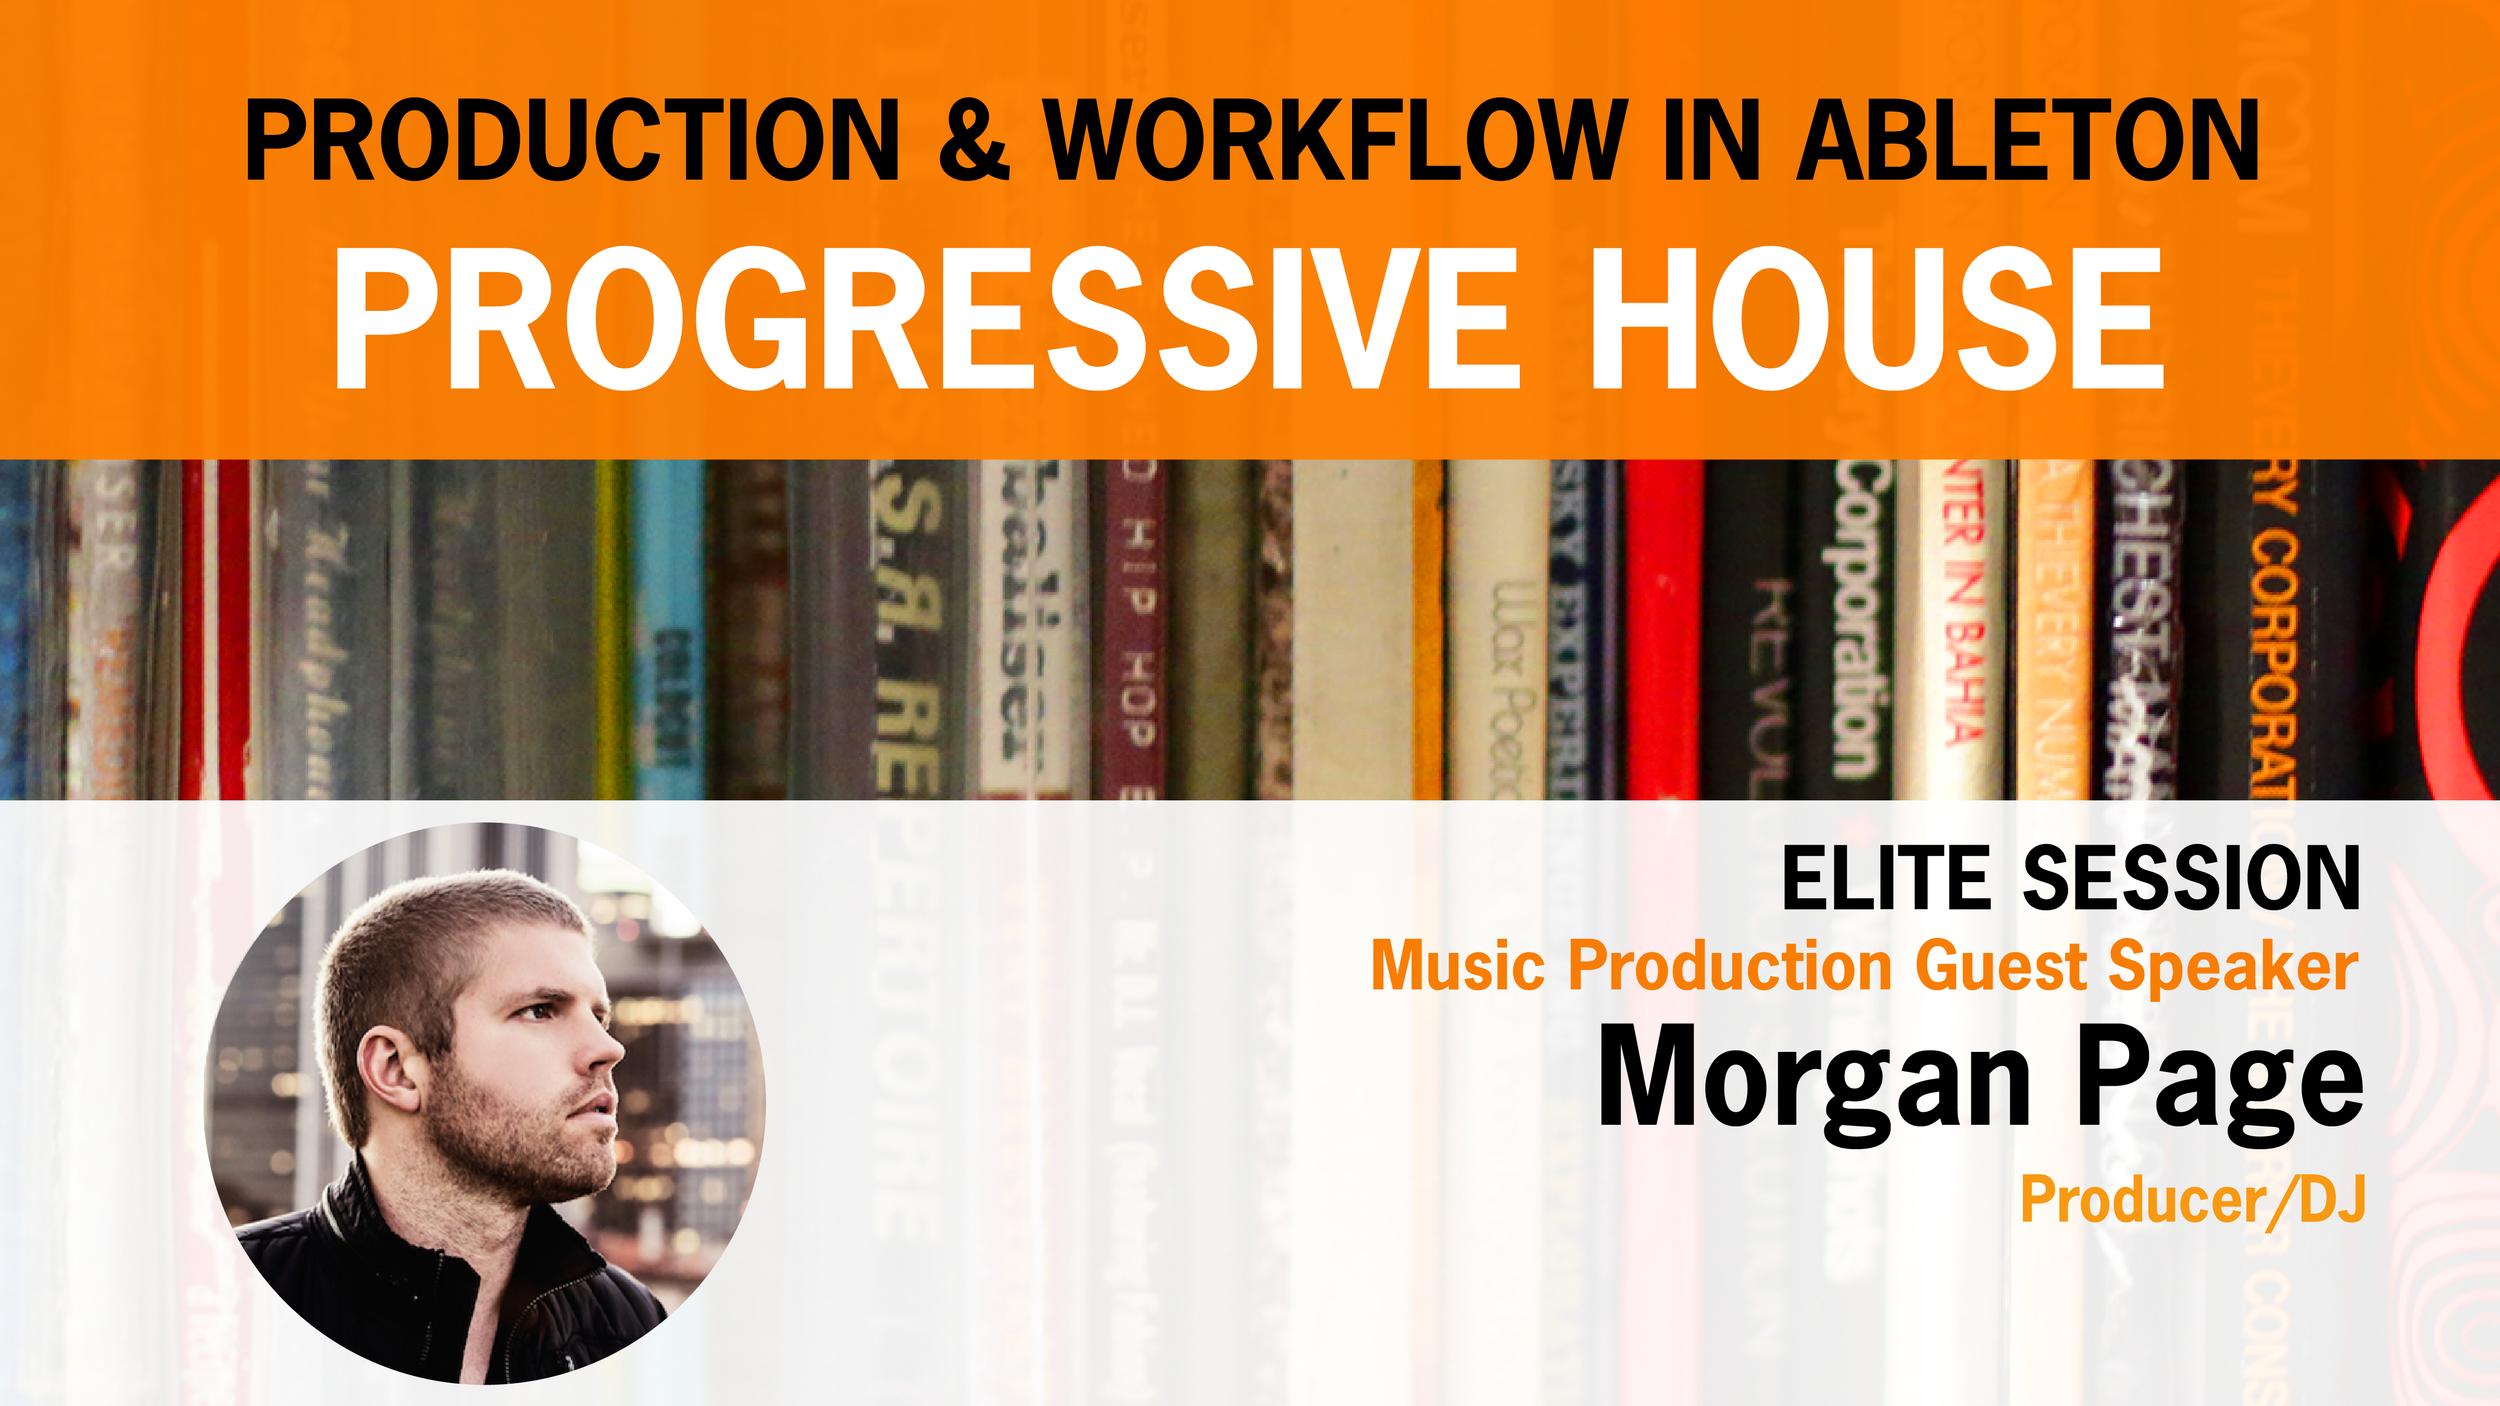 Morgan Page hosts Pyramind Elite Session